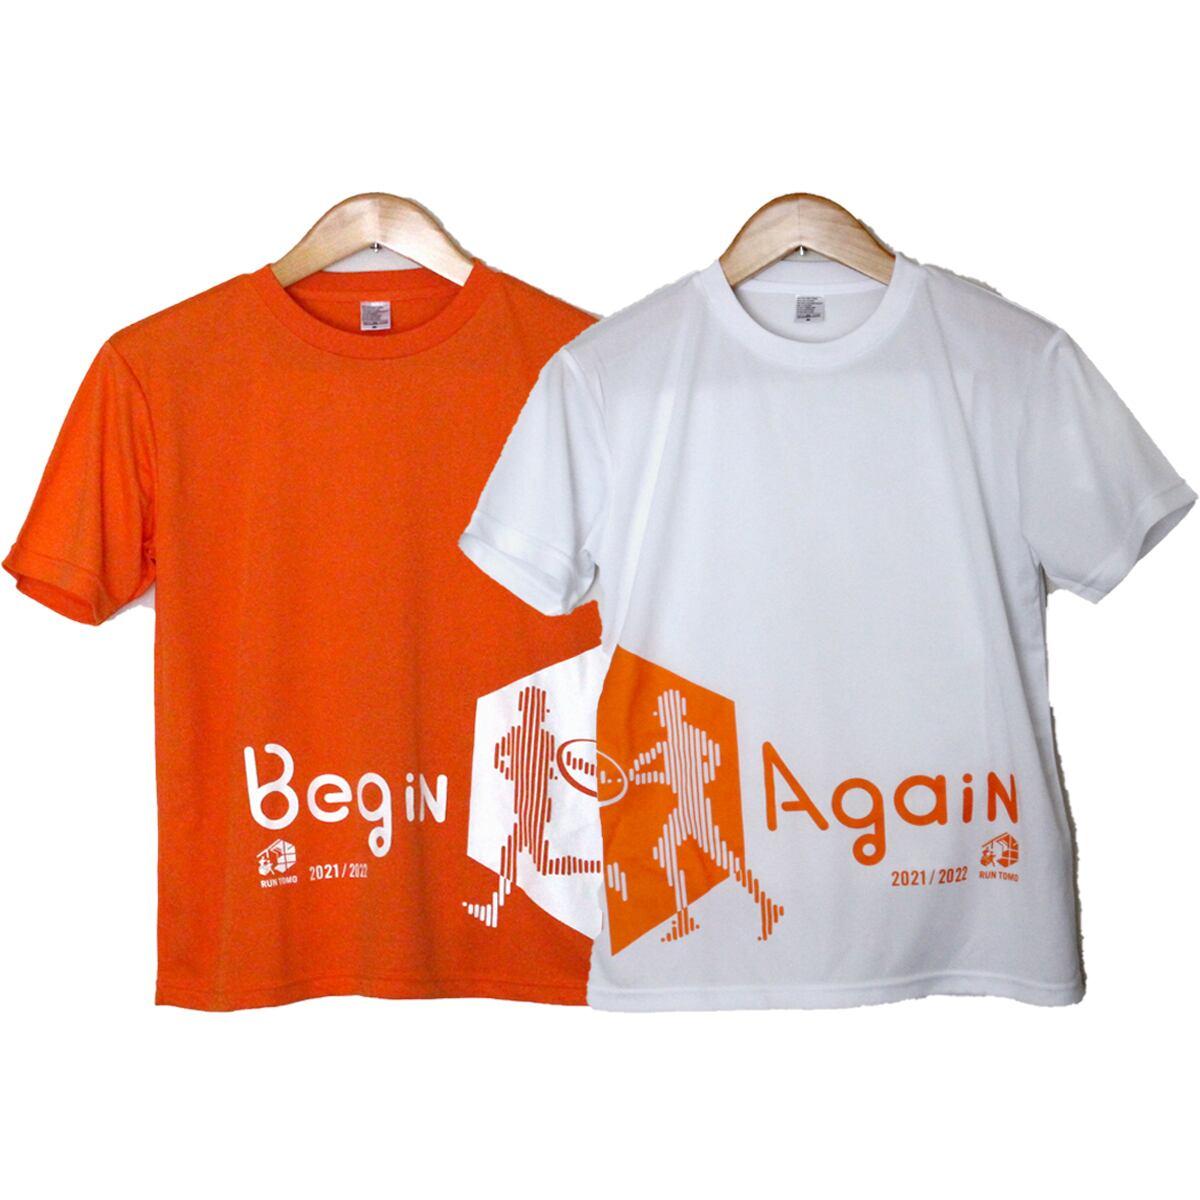 RUN伴2021/2022 公式Tシャツ 同サイズ2枚セット(オレンジ/Begin & ホワイト/Again)